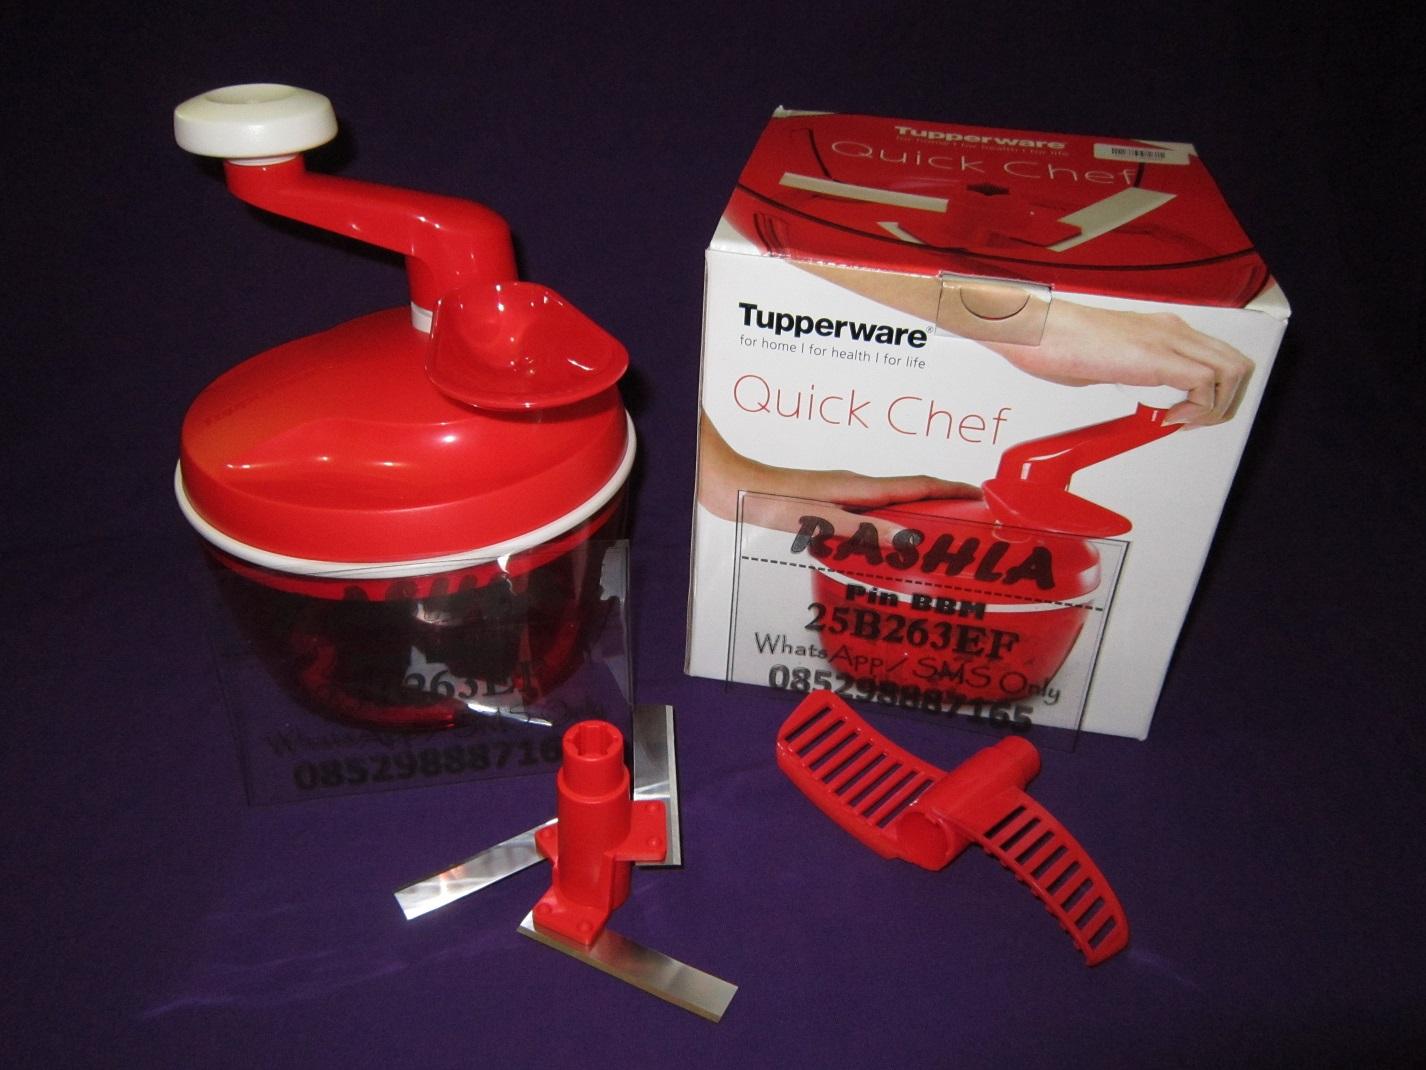 harga Quick Chef Tupperware Diskon (blender, pencacah, mixer tanpa listrik) Tokopedia.com